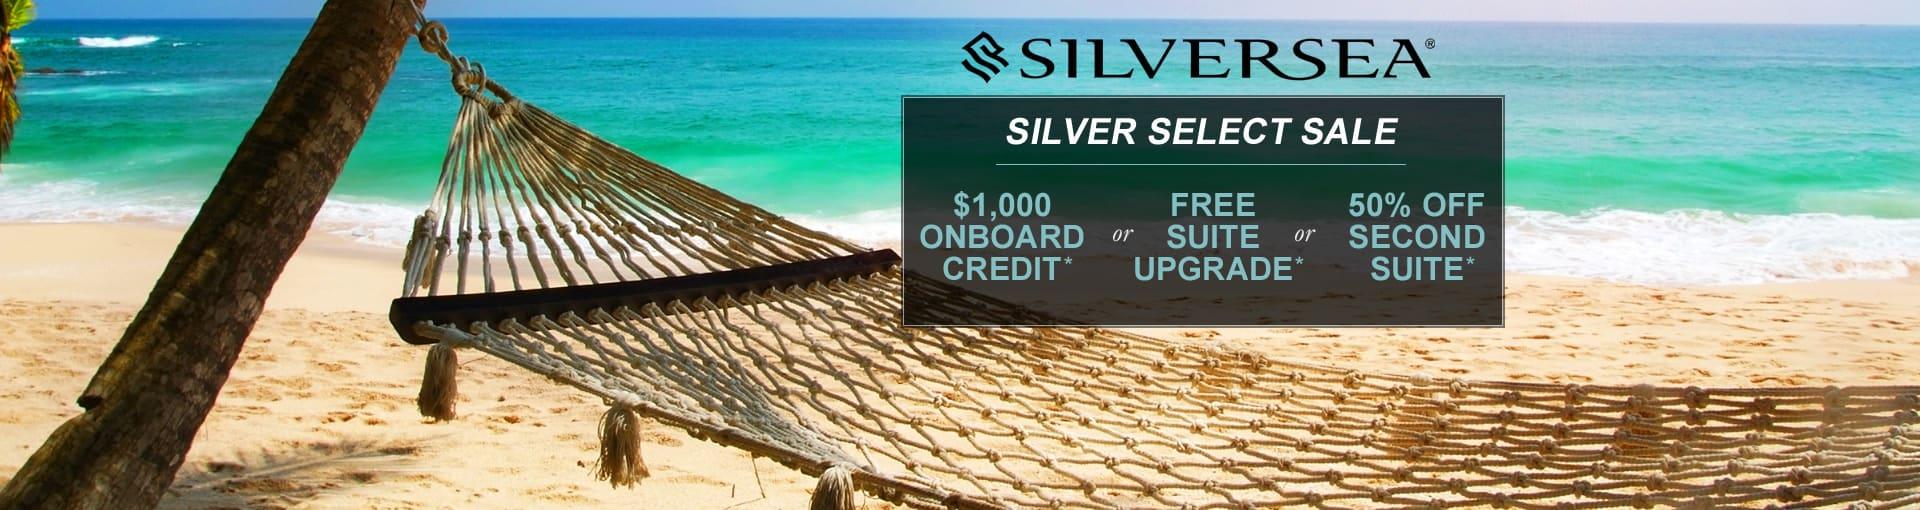 Silversea Cruises - Silver Select Sale